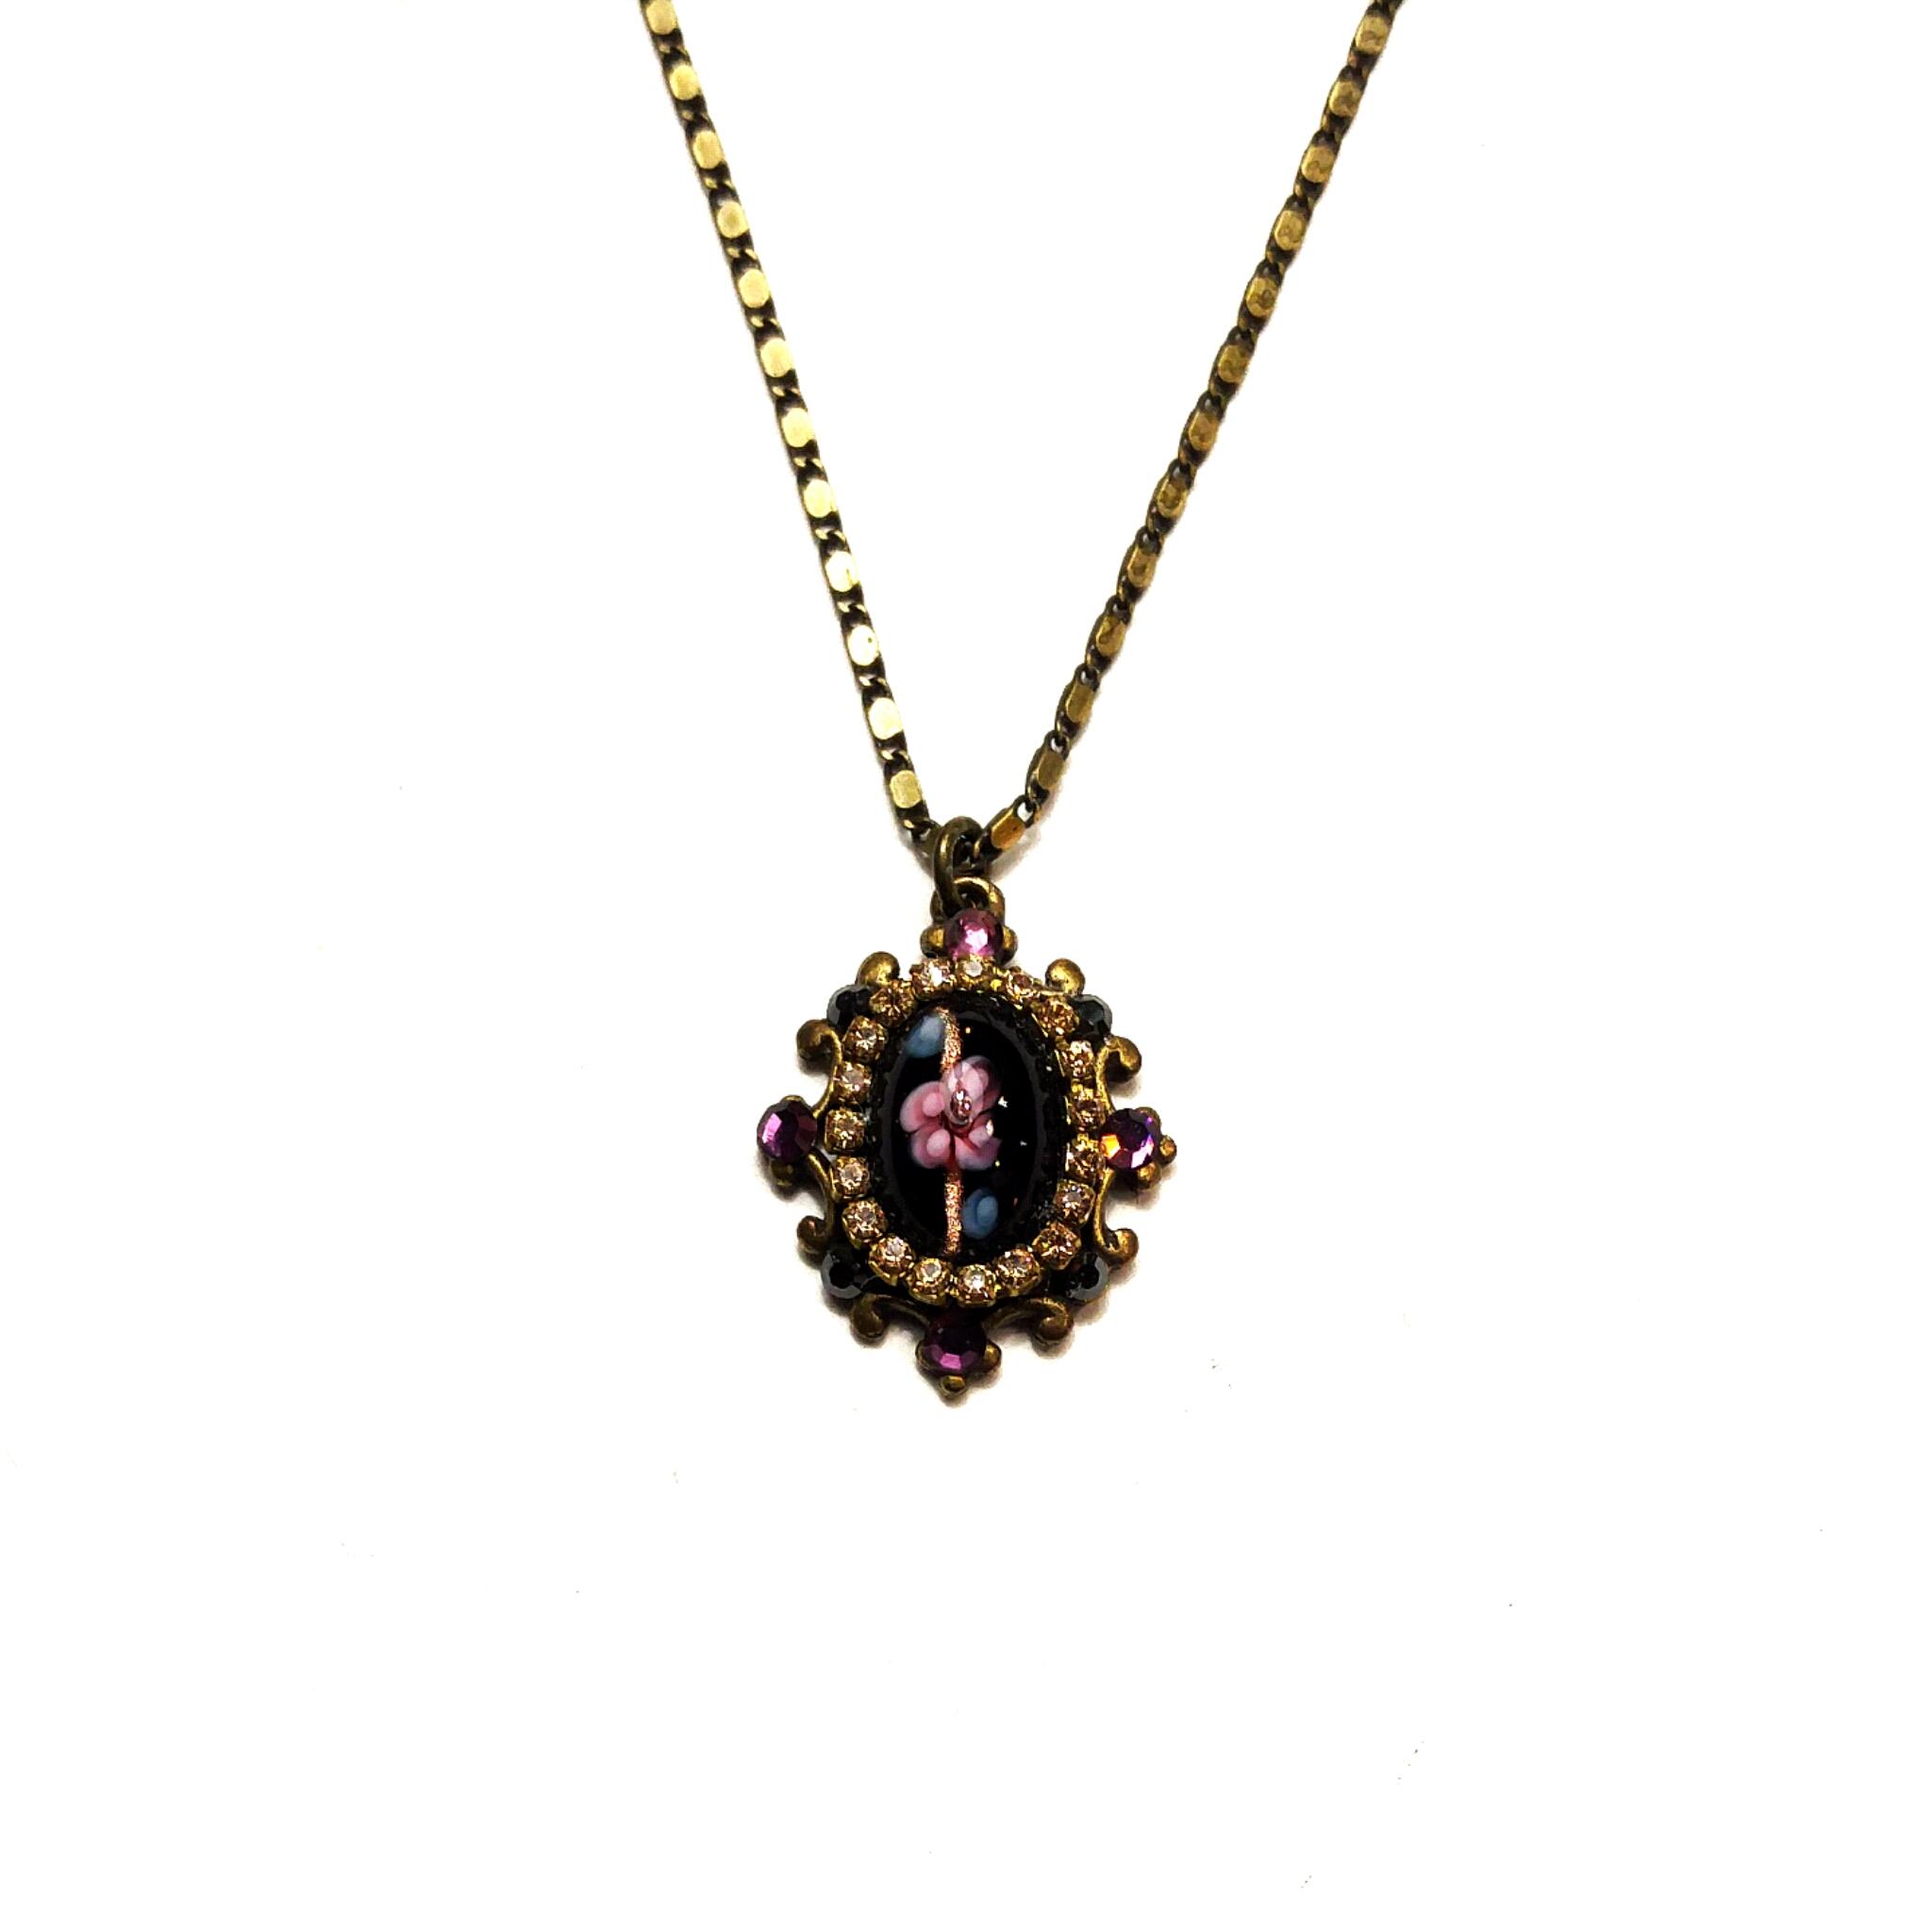 Stunning glass and rhinestone pendant